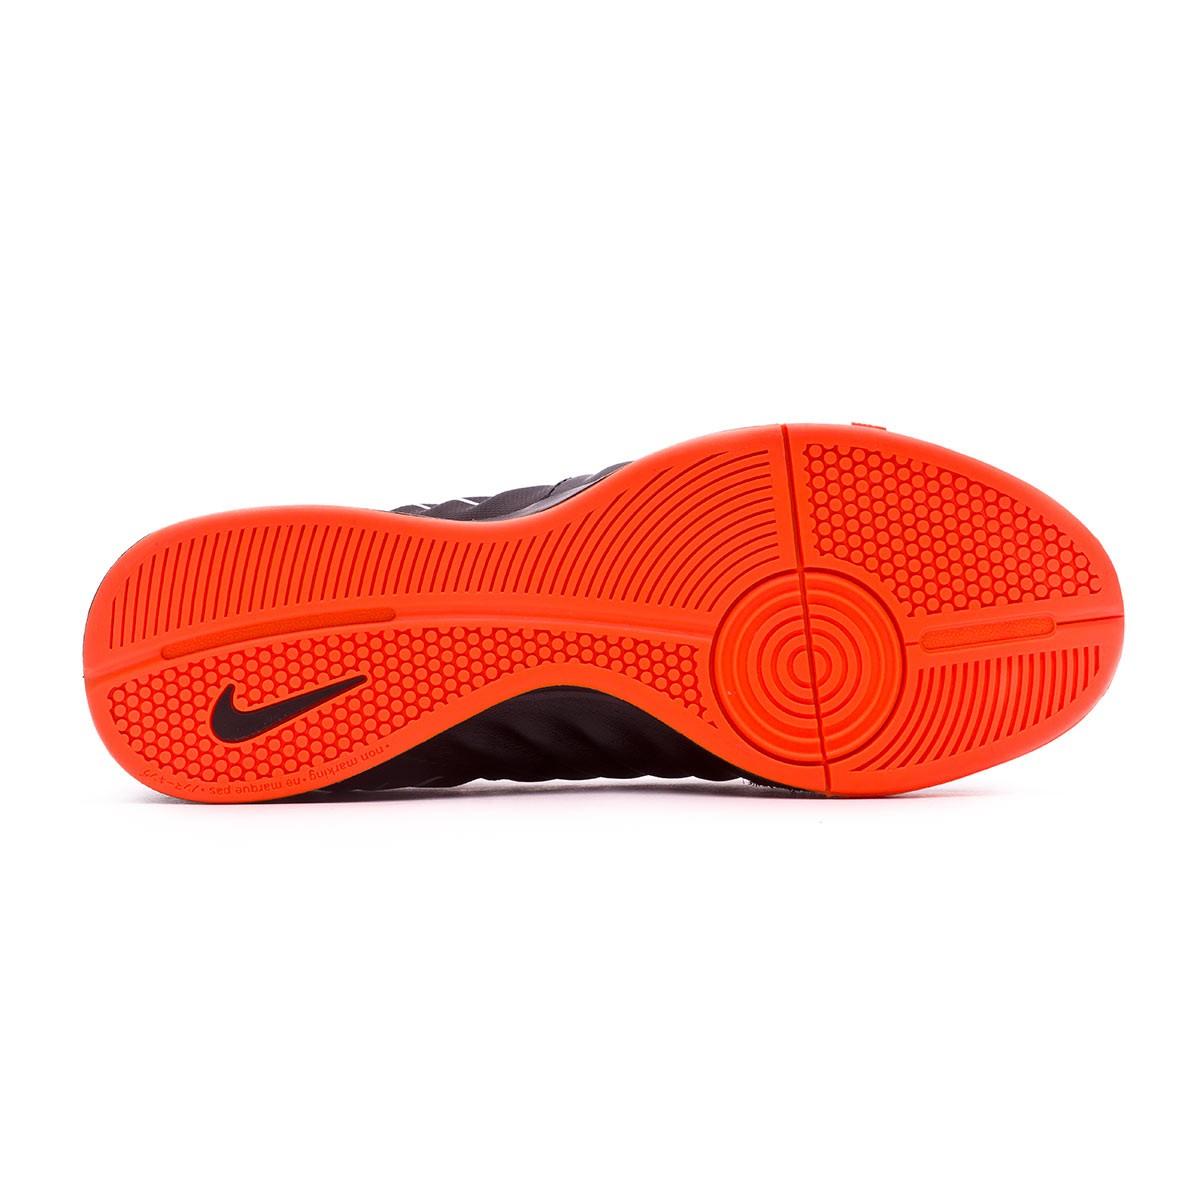 a98cc46c4 Futsal Boot Nike Tiempo LegendX VII Academy IC Black-Total orange-White -  Football store Fútbol Emotion